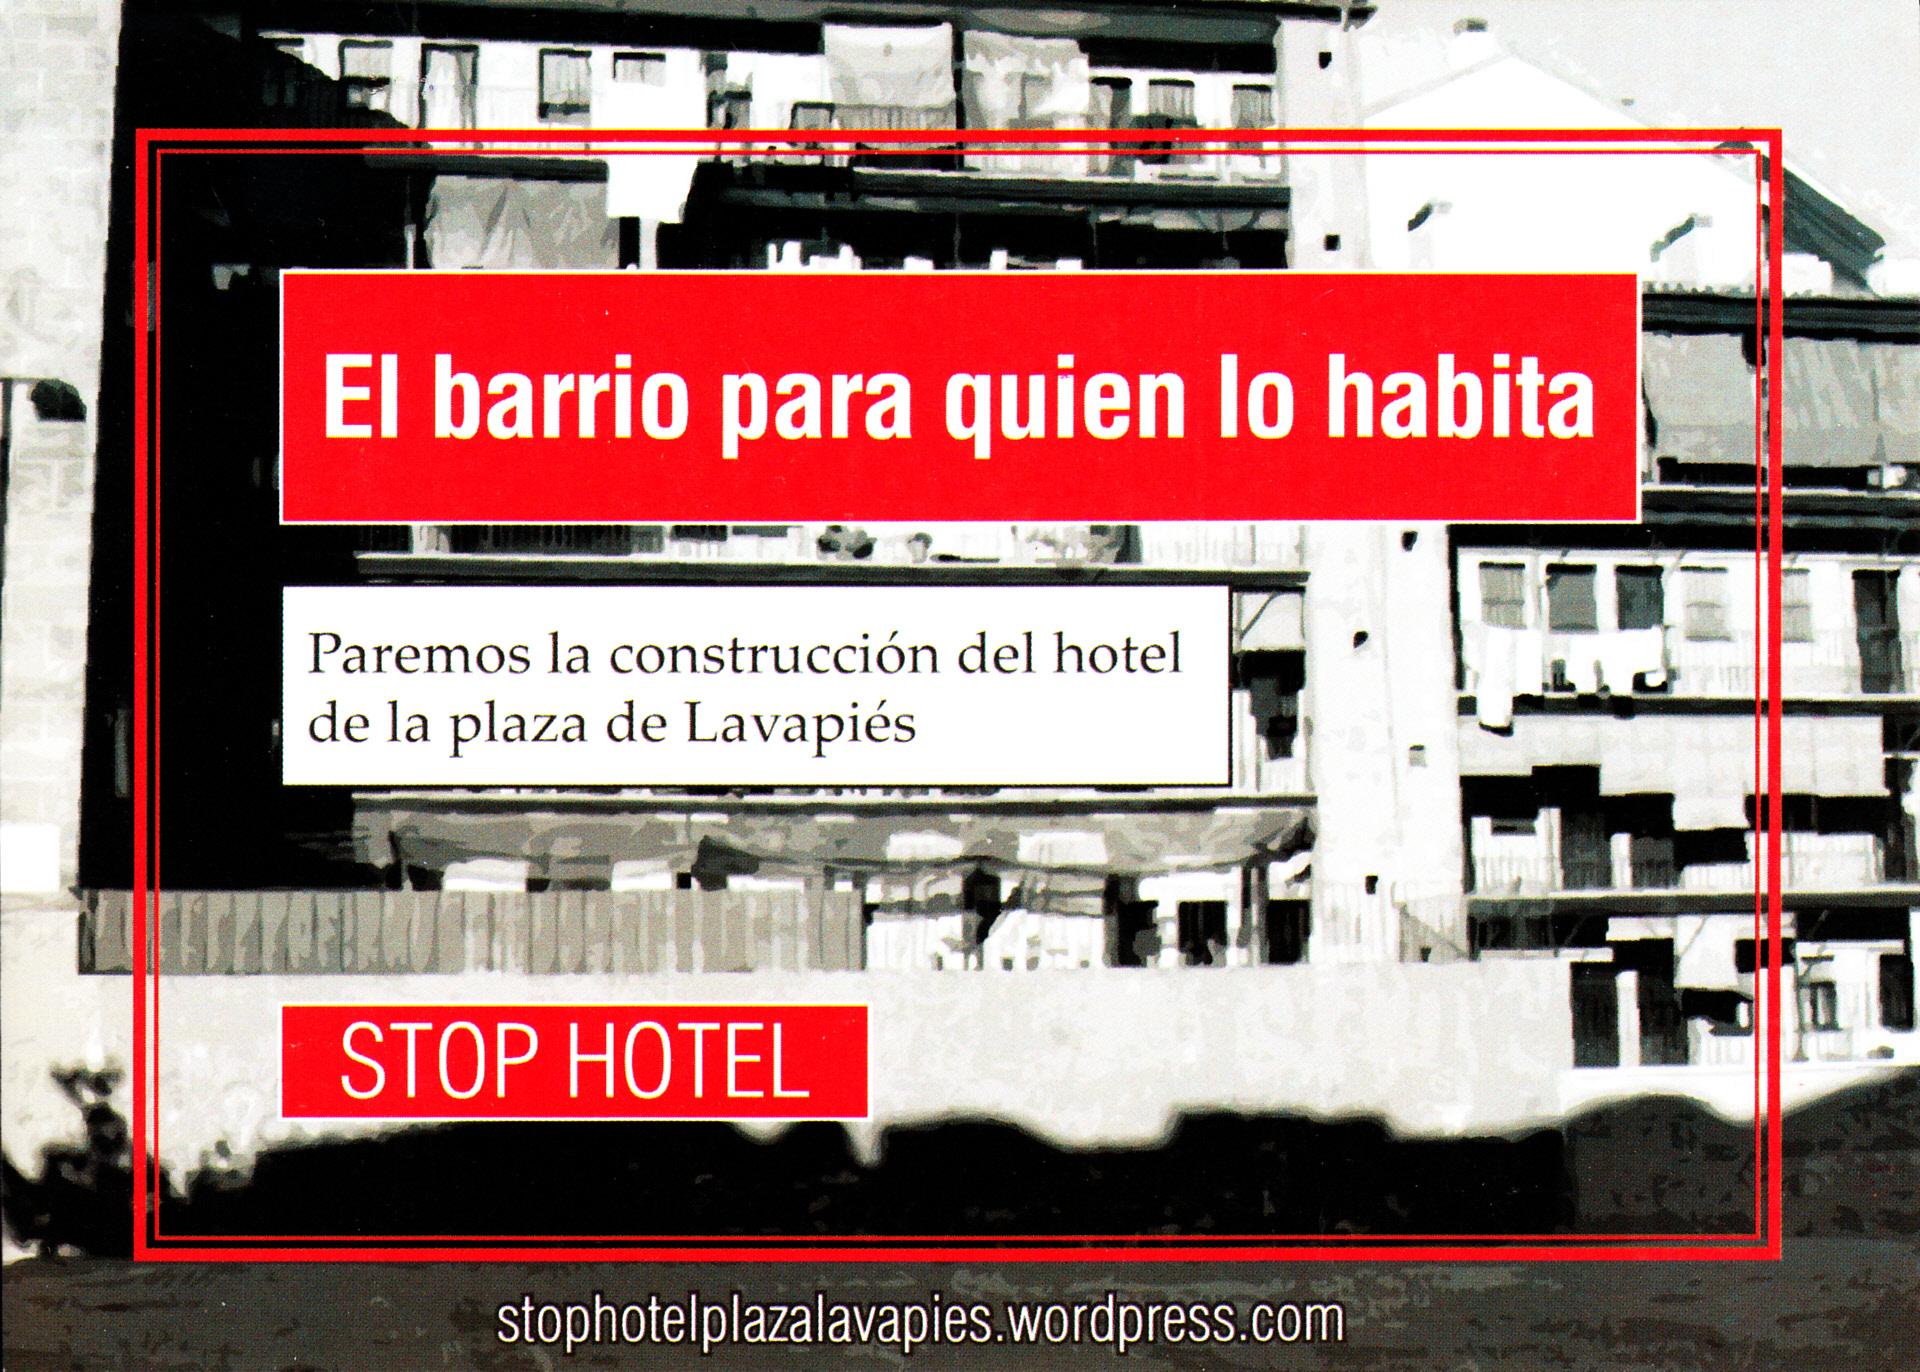 Stop hotel_autoc_0001